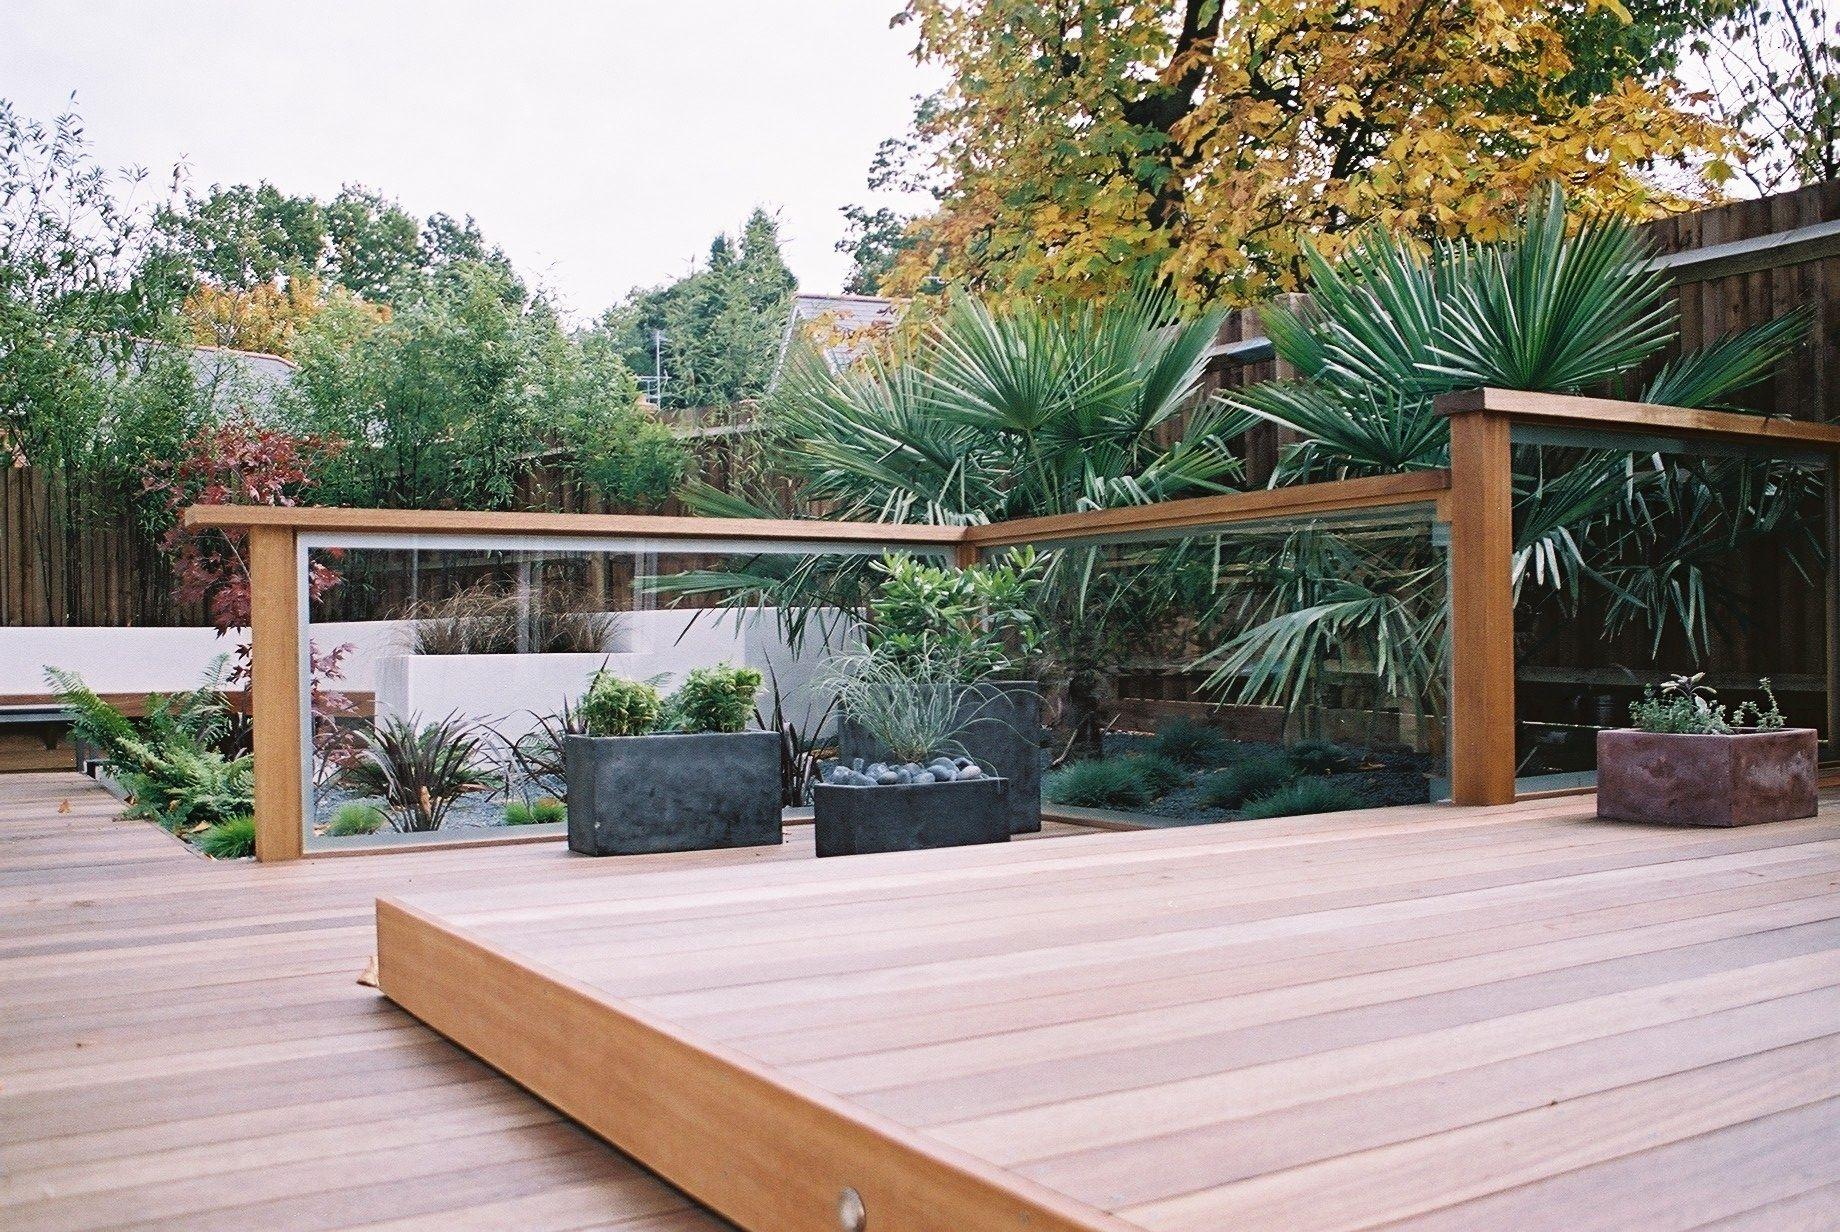 Split level deck with glass screens | Outdoor gardens ... on Split Level Backyard Ideas id=61434